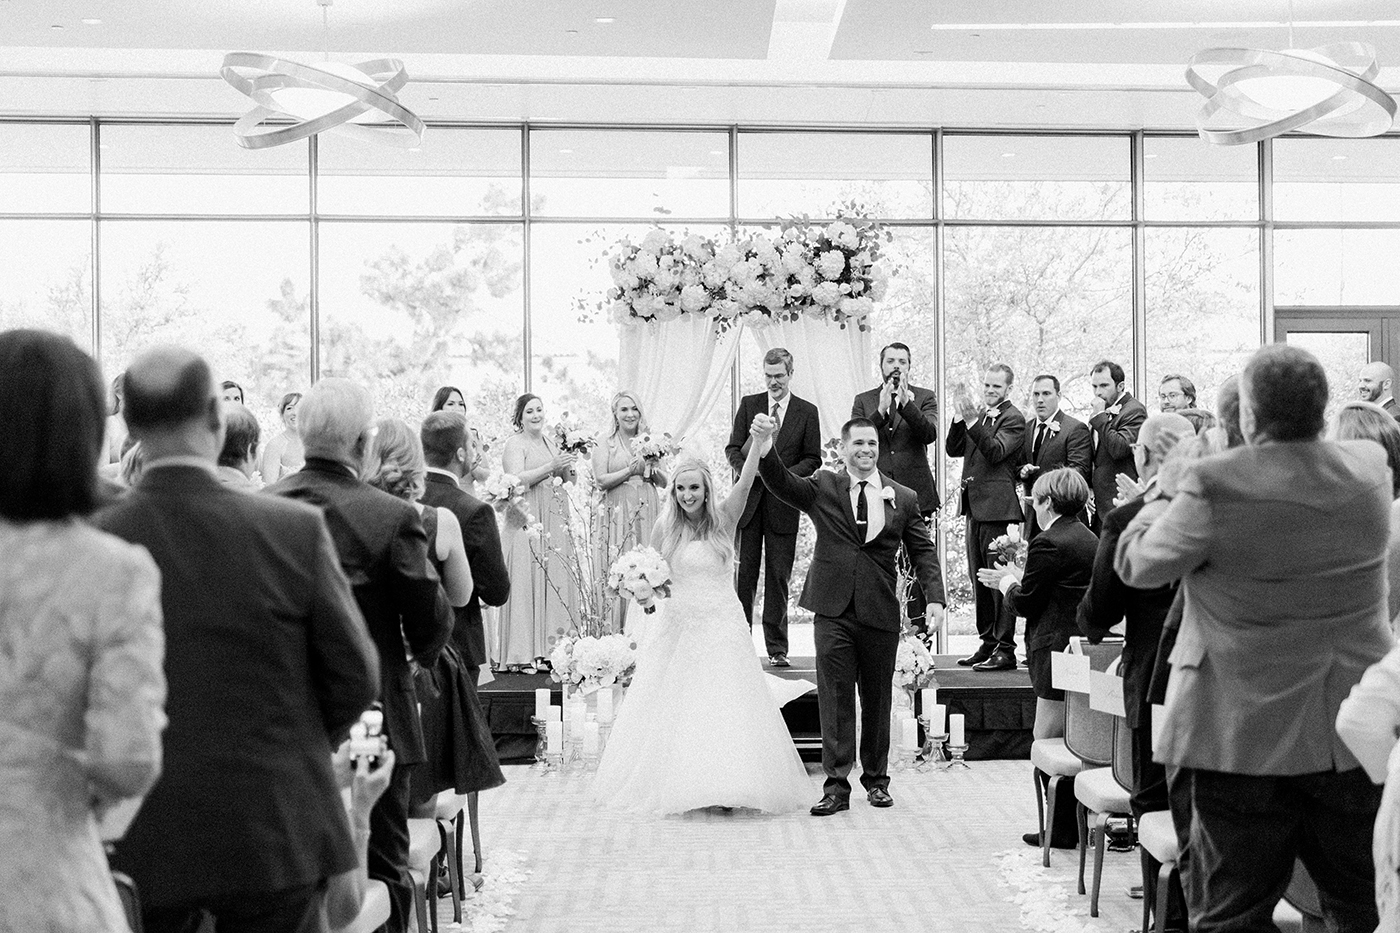 DFW Wedding Planner - Caroline + Jeff at The Four Seasons Hotel Wedding - Allday Events - 109.jpg